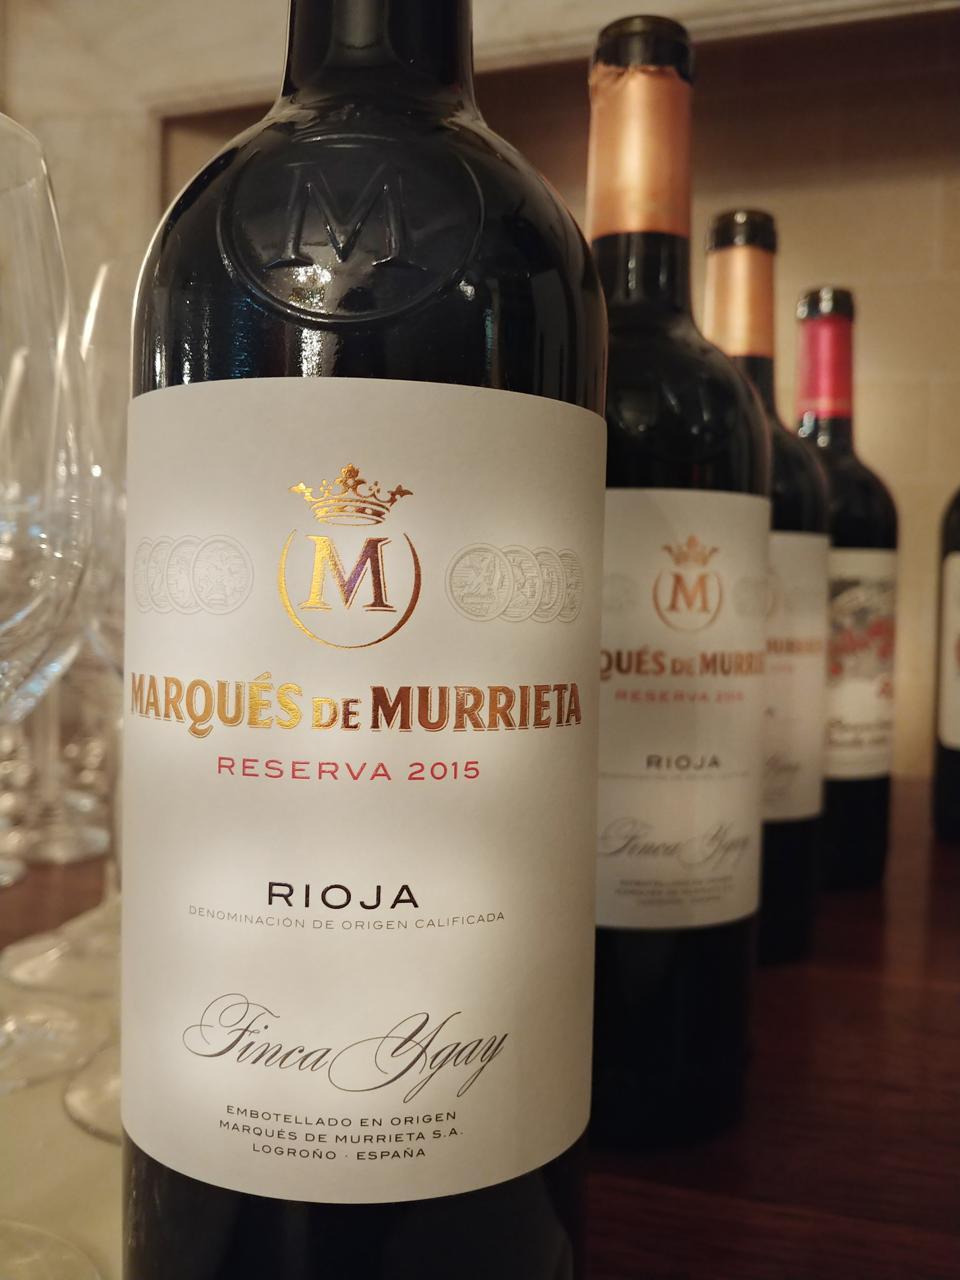 2015 Marqués de Murrieta, Reserva, Rioja Alta, Spain